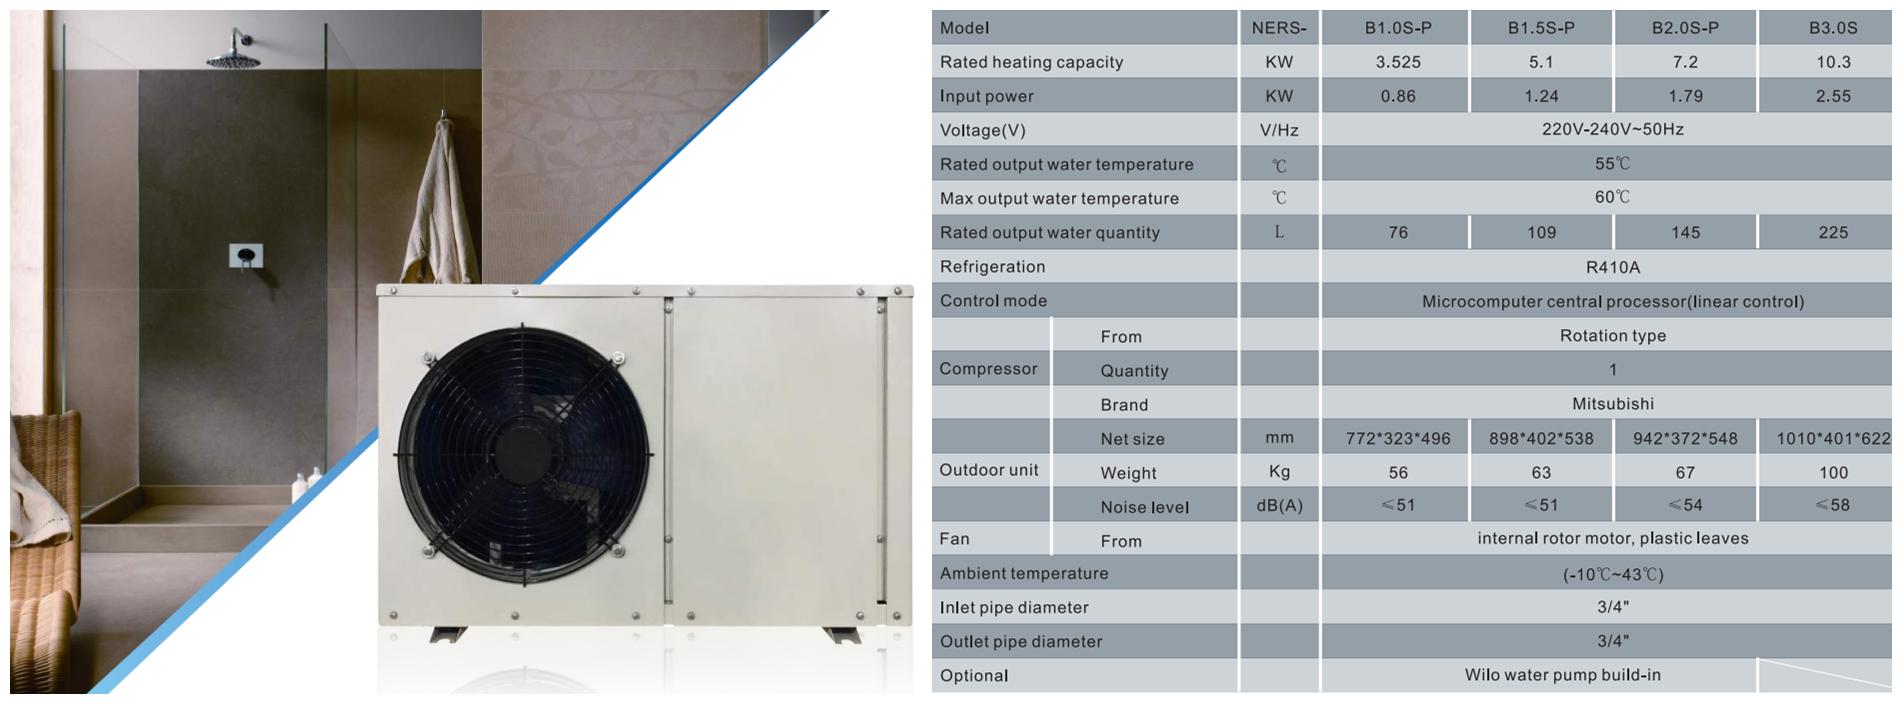 NULITE-Domestic Air Source Heat Pump-nulite New Energy Heat Pumps At India Acrex 2019-3